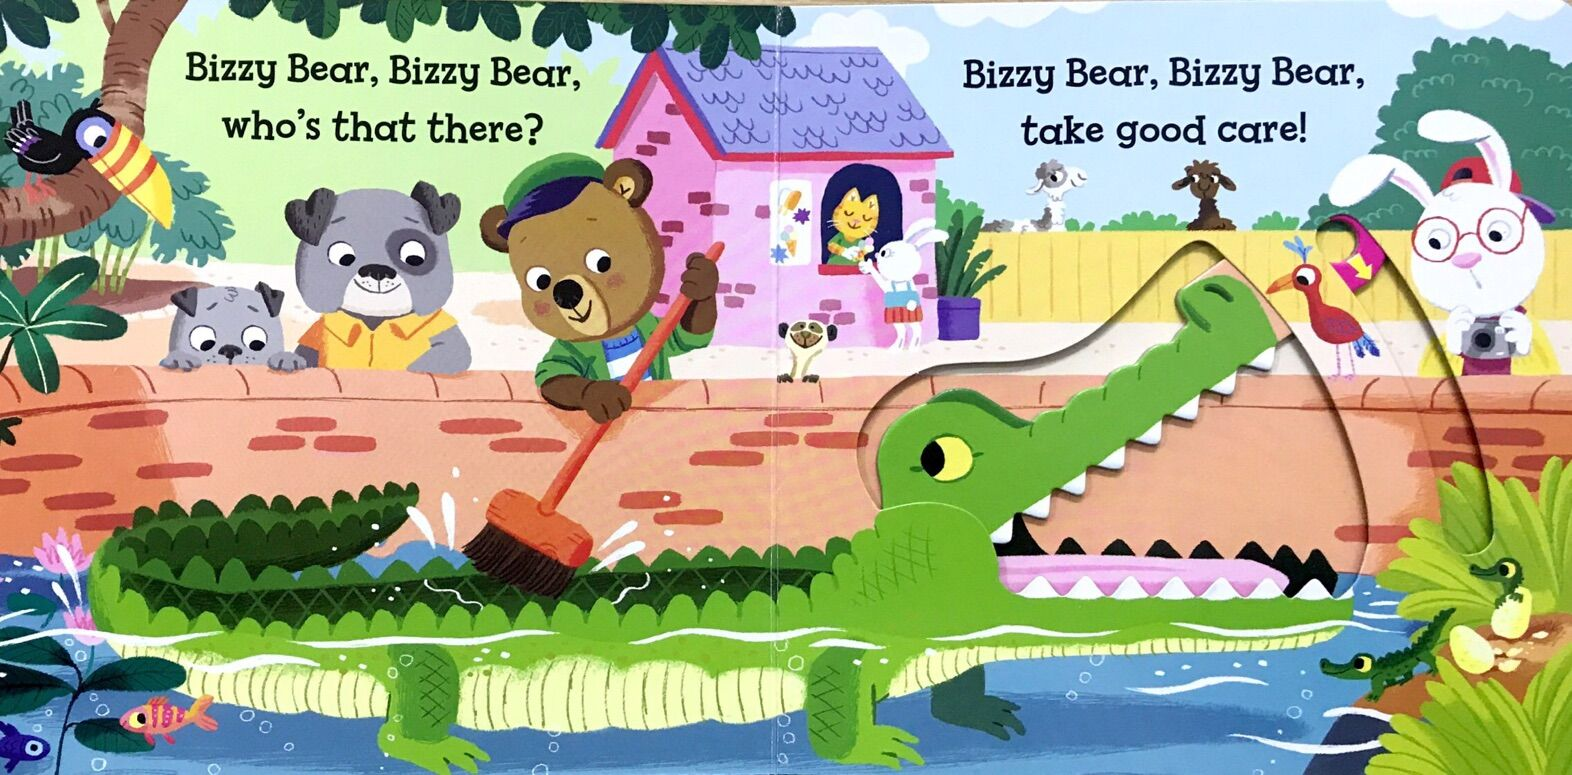 Bizzy Bear:Zoo Ranger 忙碌的小熊:管理员(有红标)